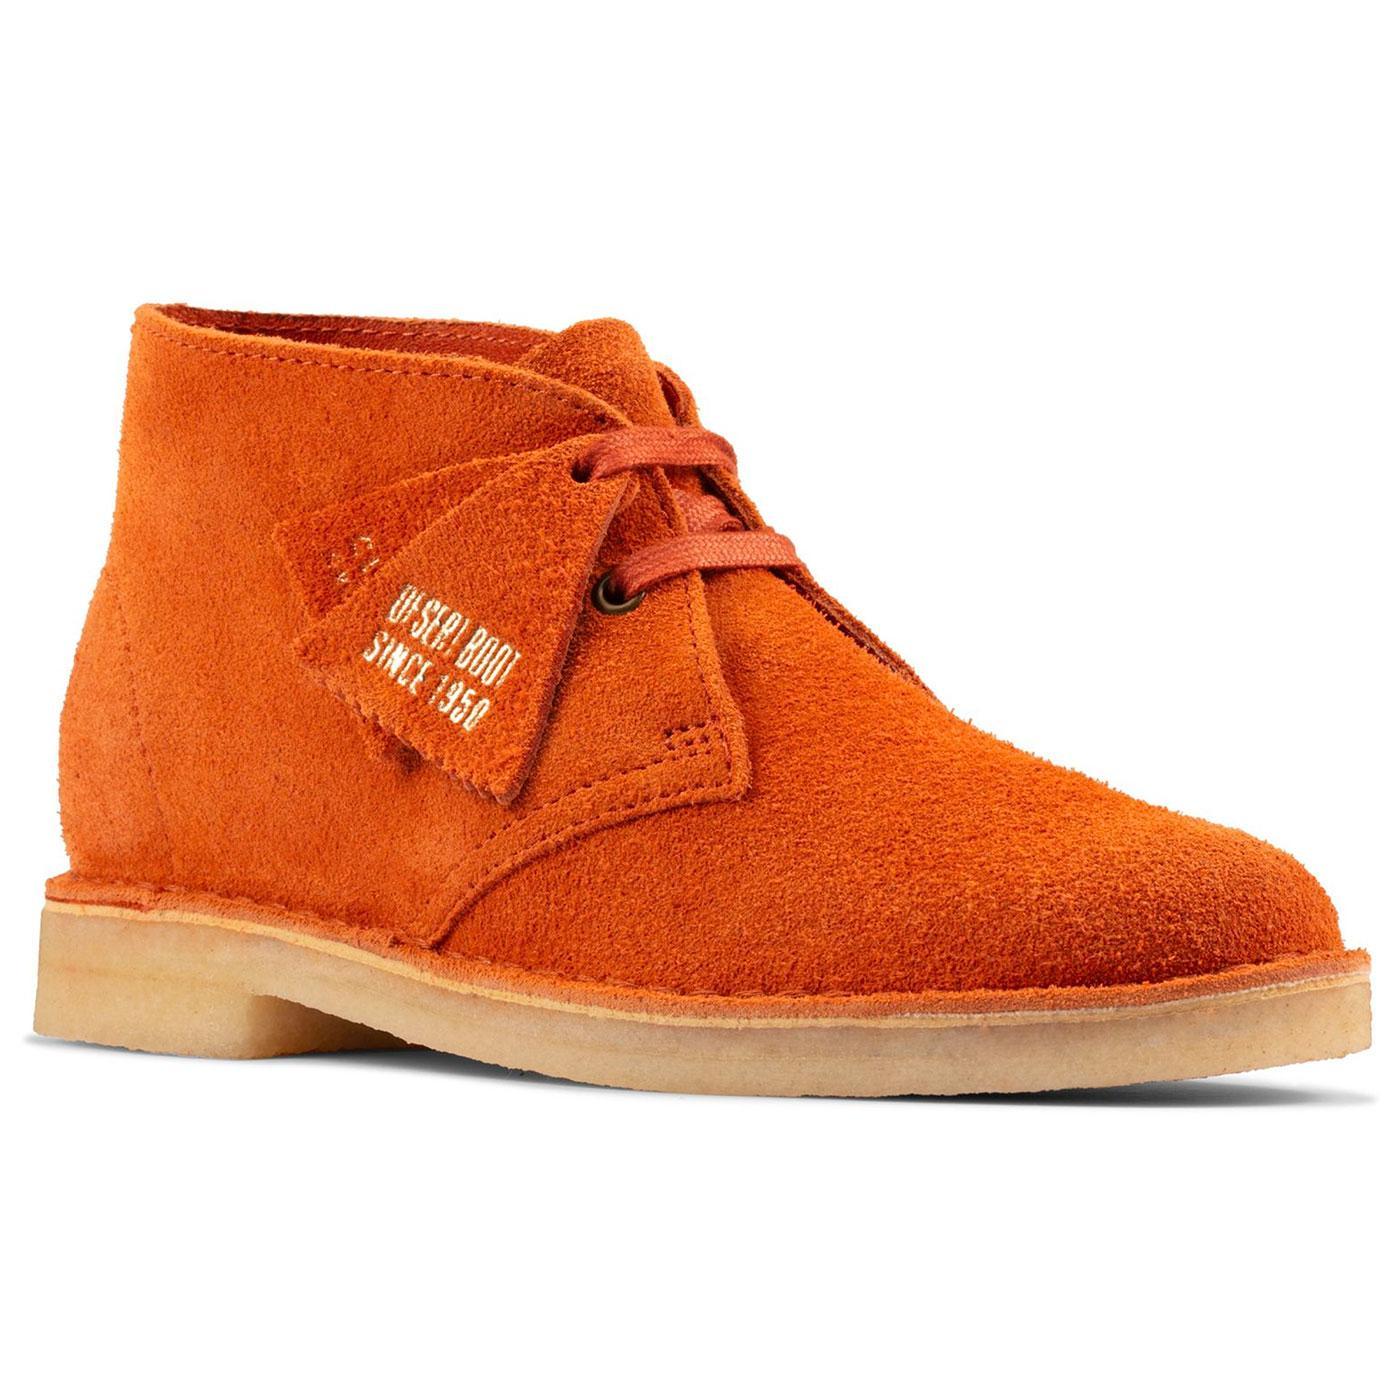 CLARKS ORIGINALS Mod Suede Desert Boots (Ginger)